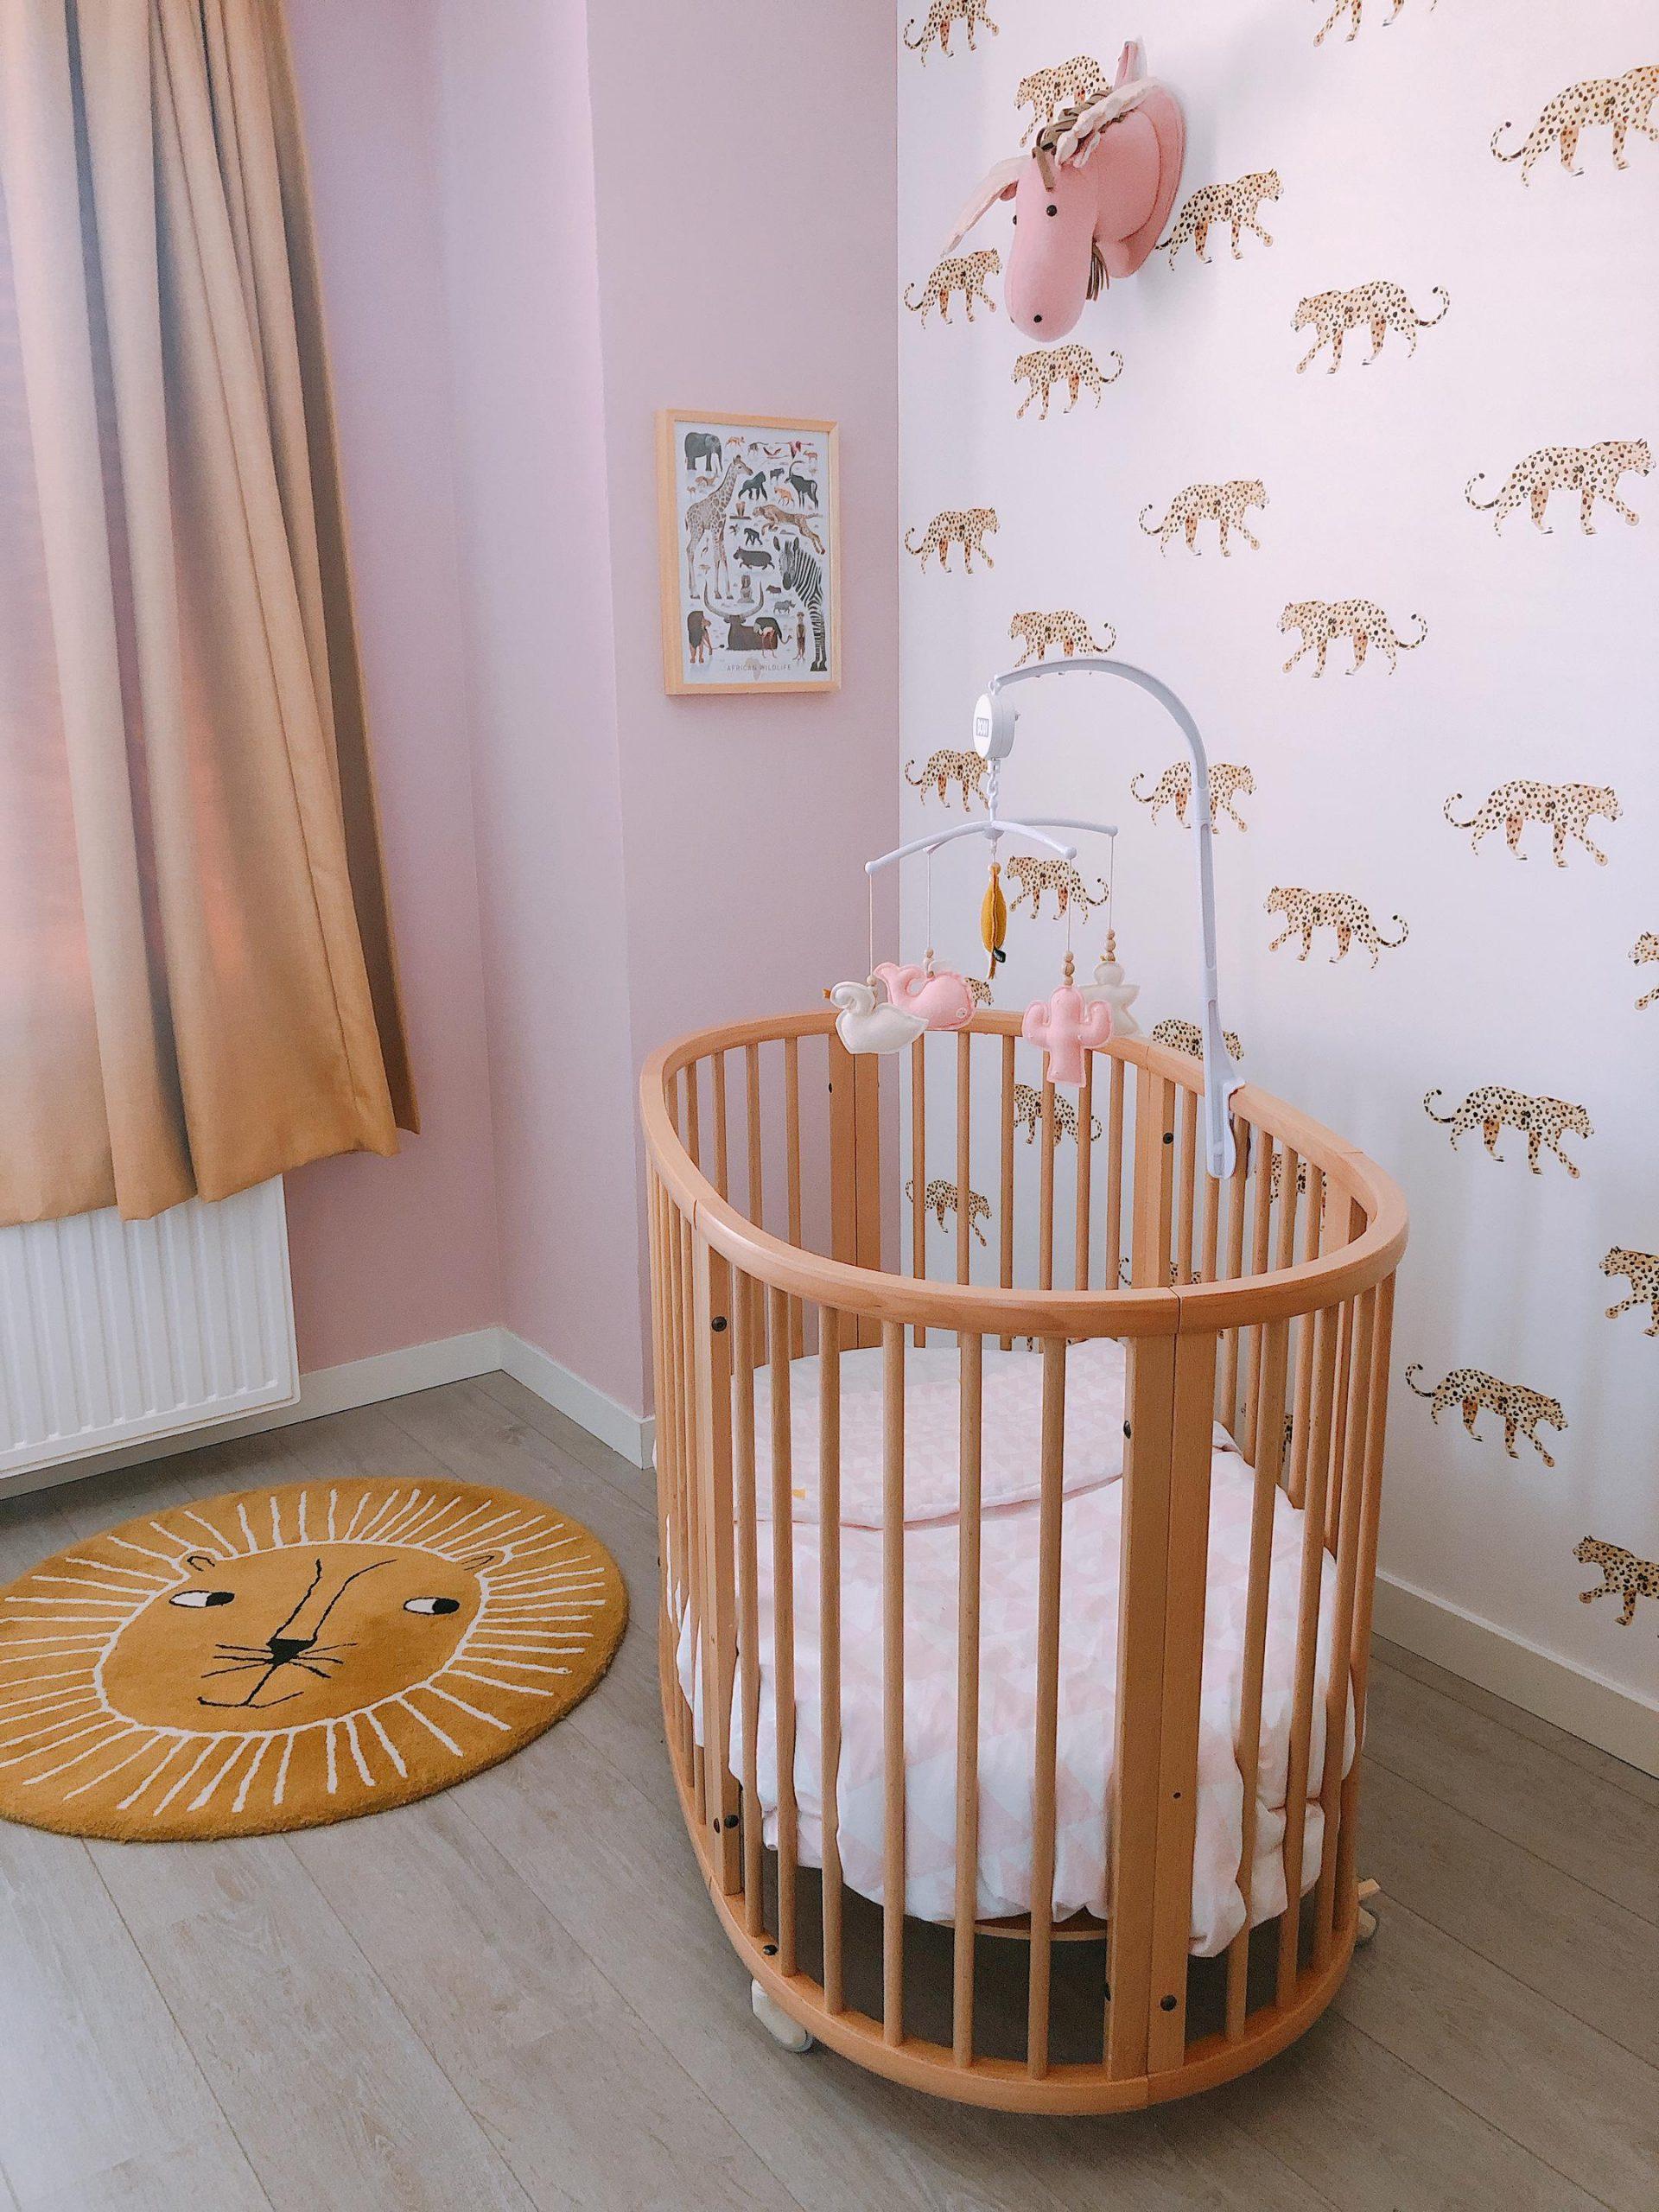 IMG 6869 2160x2880 2 scaled - De baby/kinderkamer van Hazel - roze, hout & marmer!